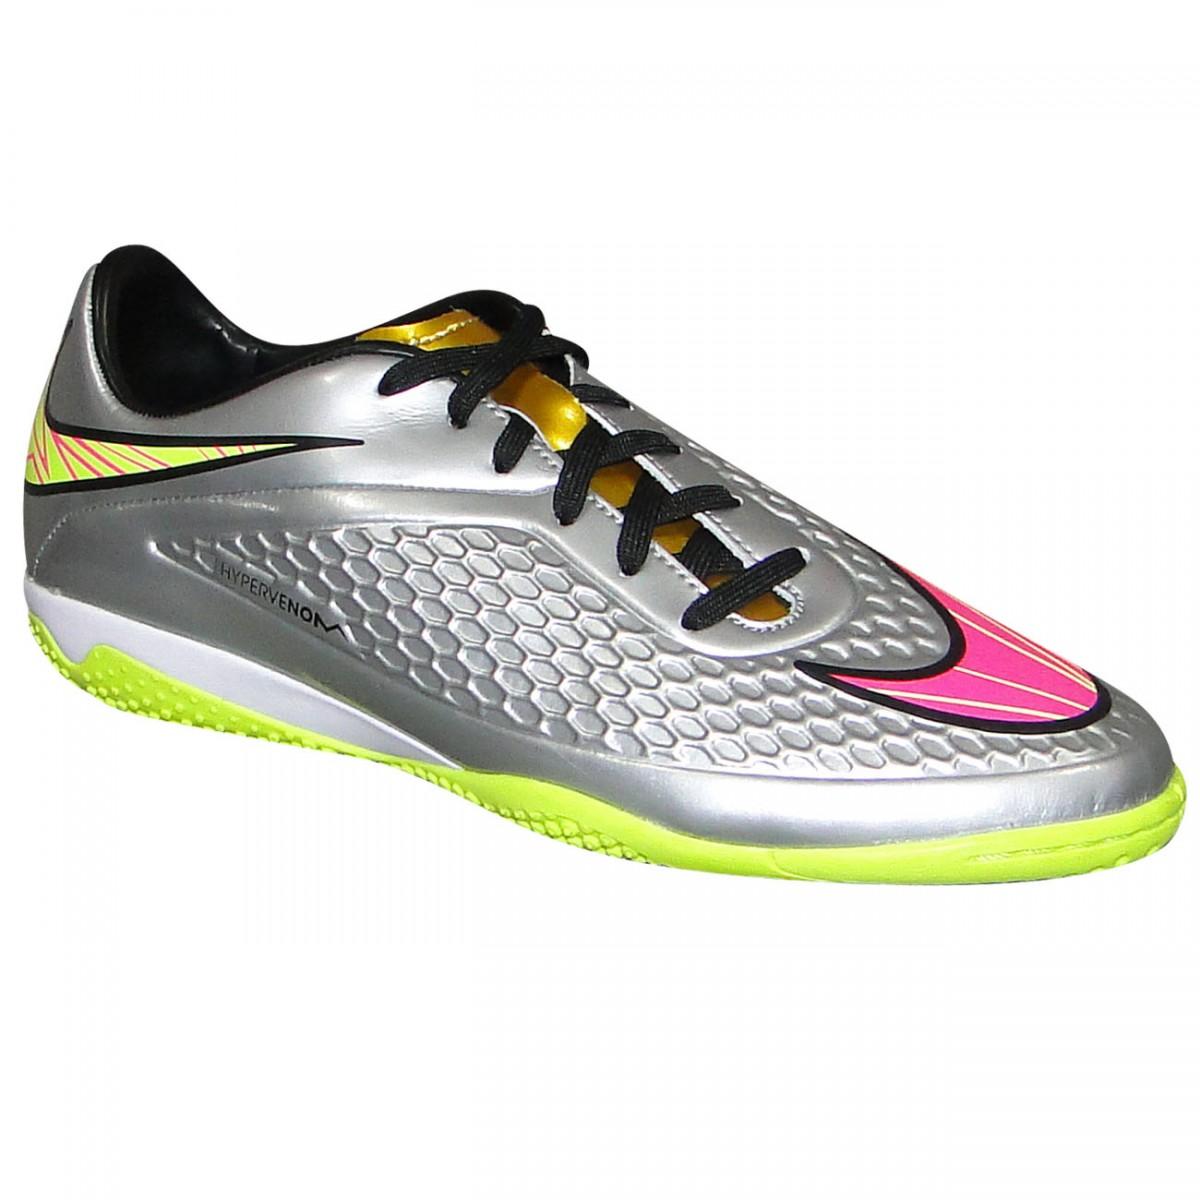 7caa367ccbb Tenis Nike Hypervenom Phelon Prem 677587-069 - Prata Pink - Chuteira ...